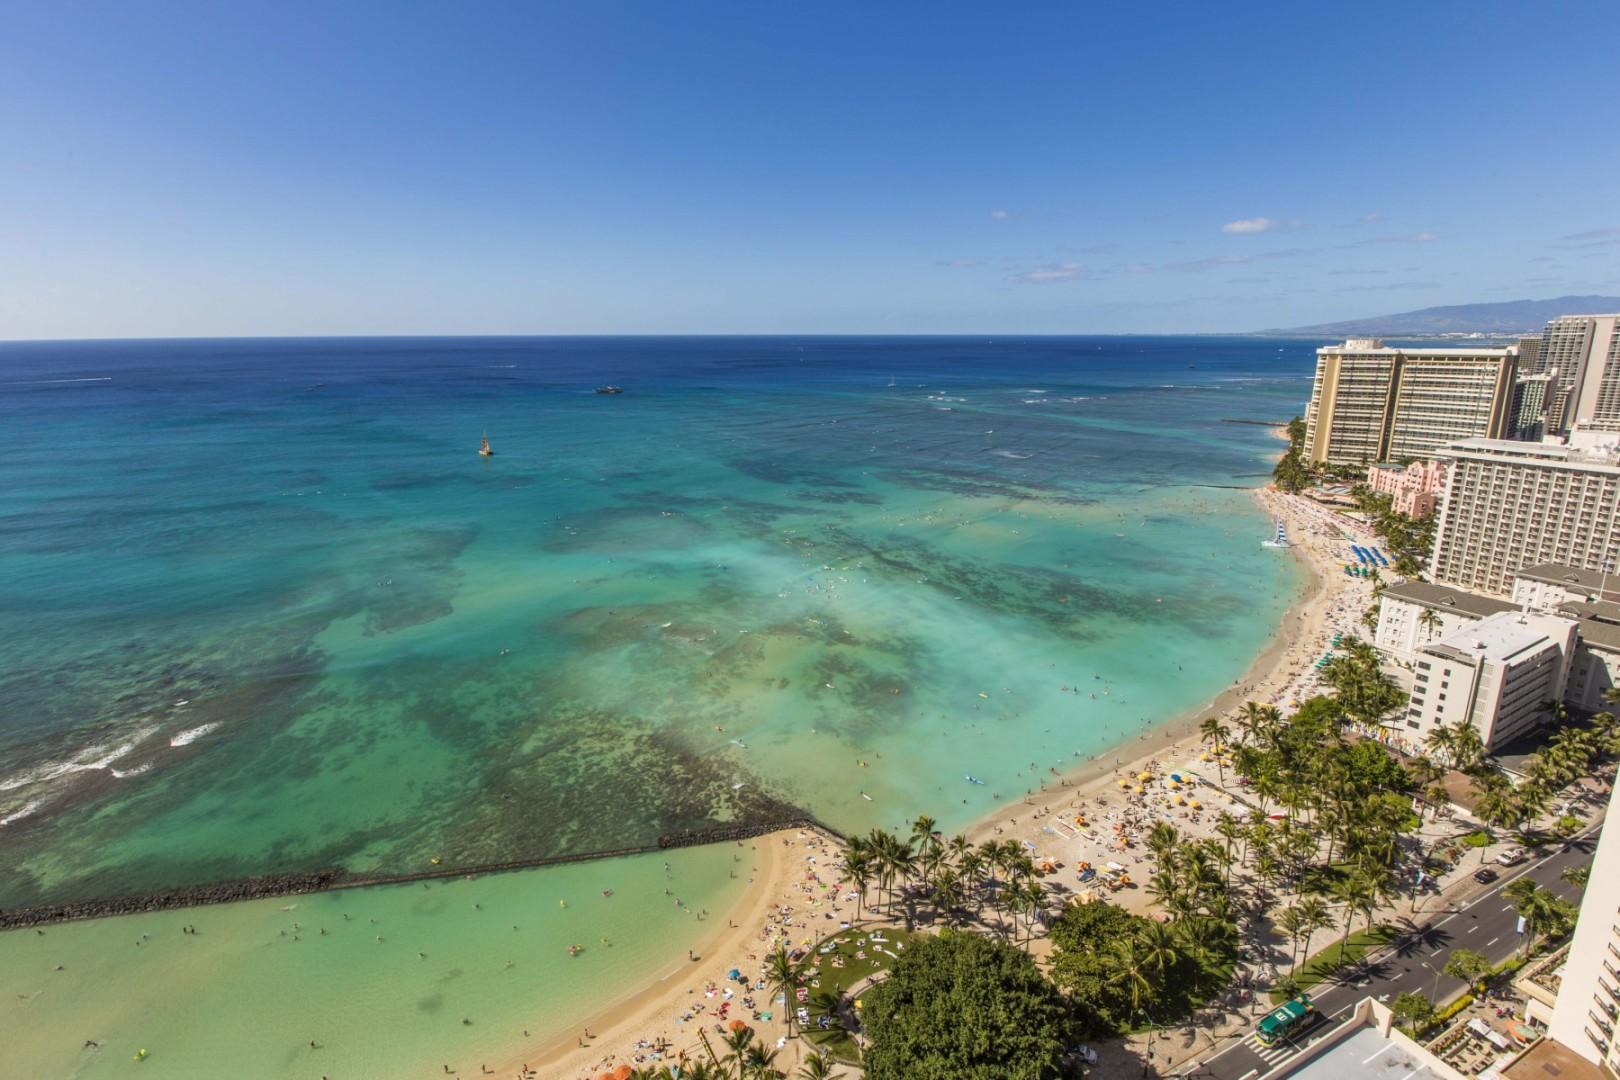 Arial view of Waikiki.